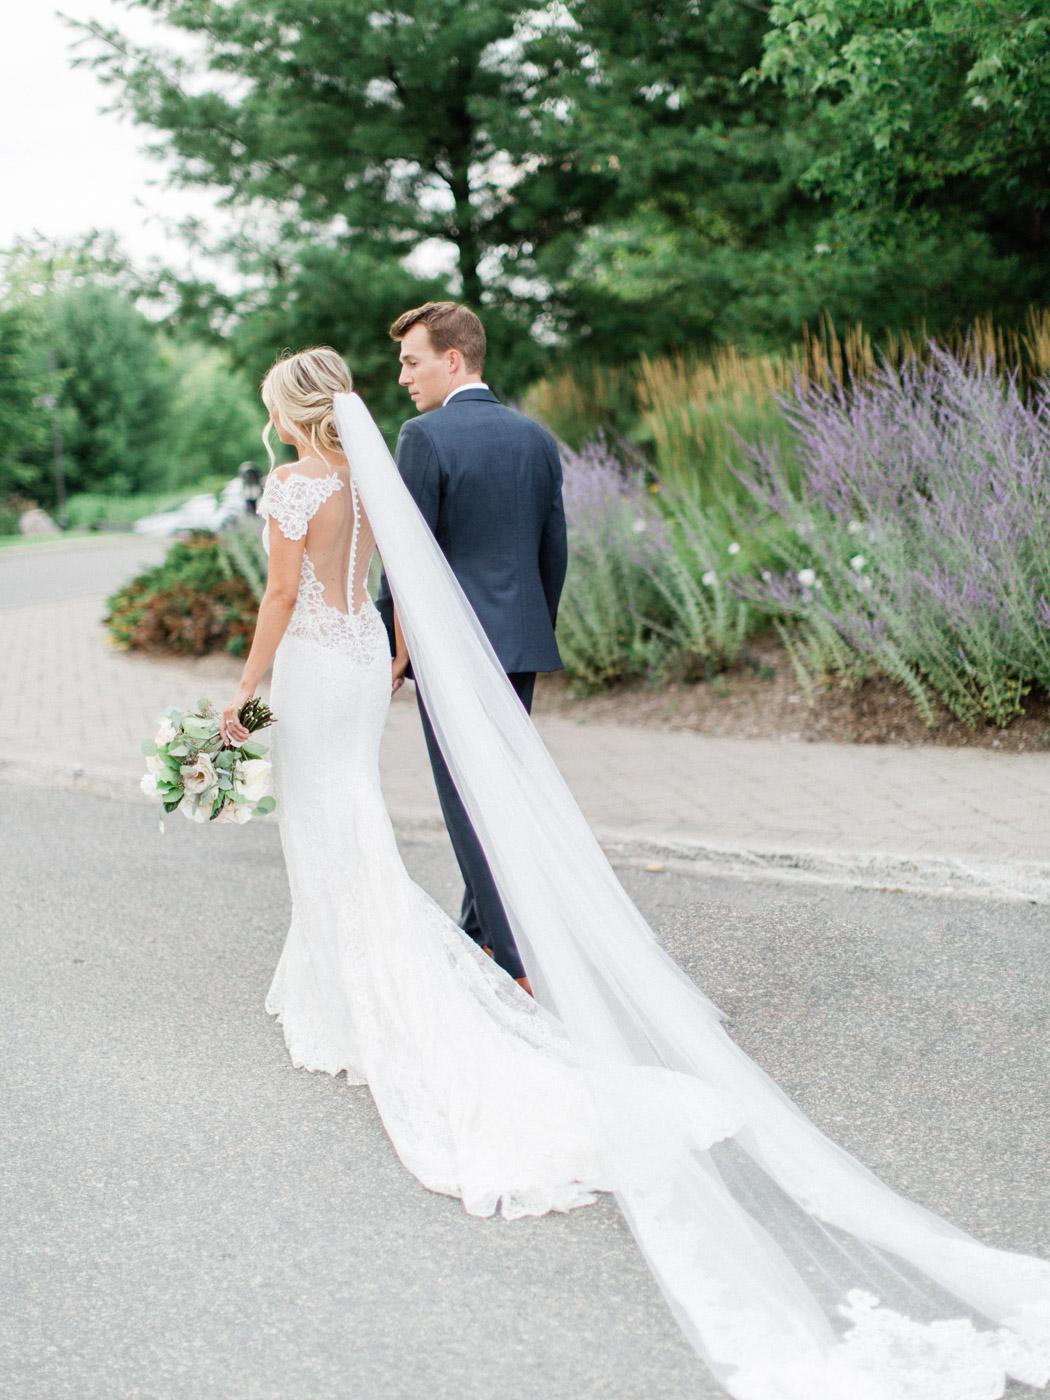 Toronto-Muskoka-wedding-photographer-summery-fun-documentary-the-marriott-rosseau101.jpg